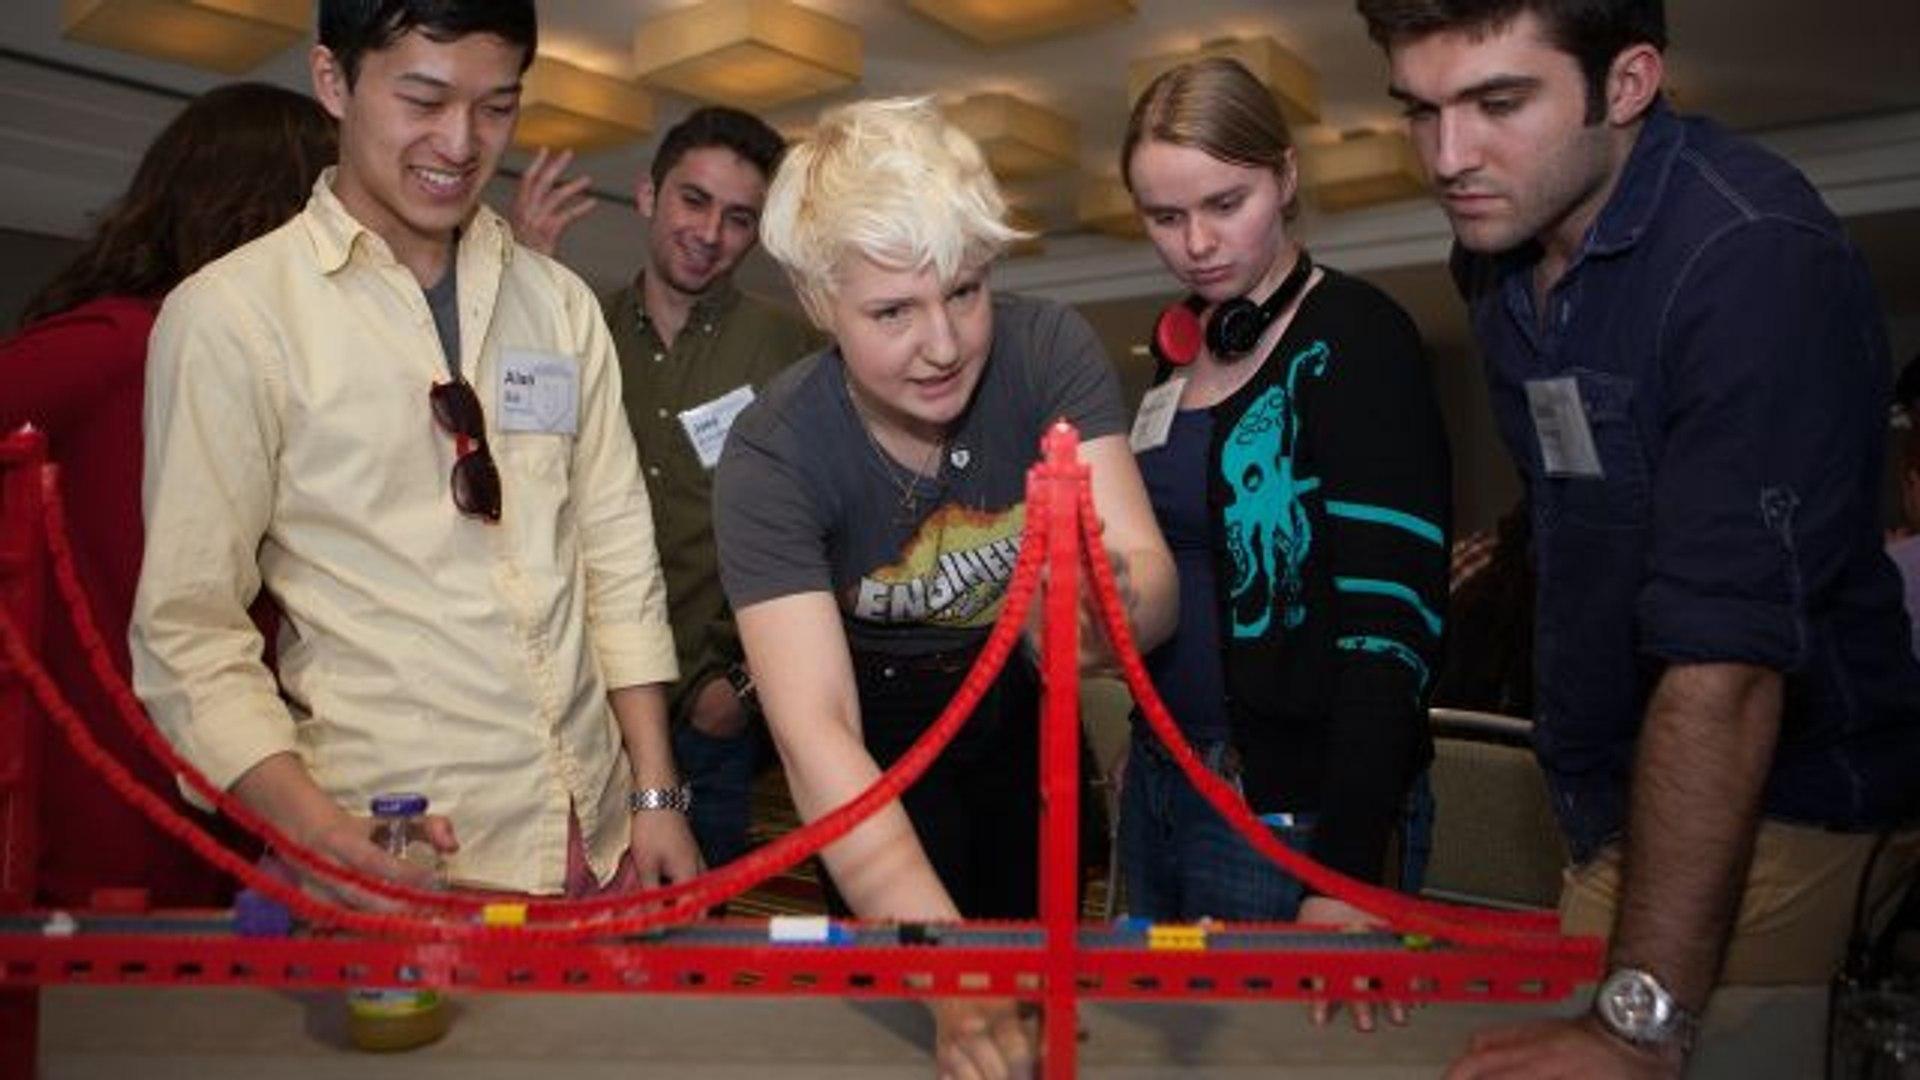 Teen Technorati  - The LEGO Challenge: Creative Problem-Solving